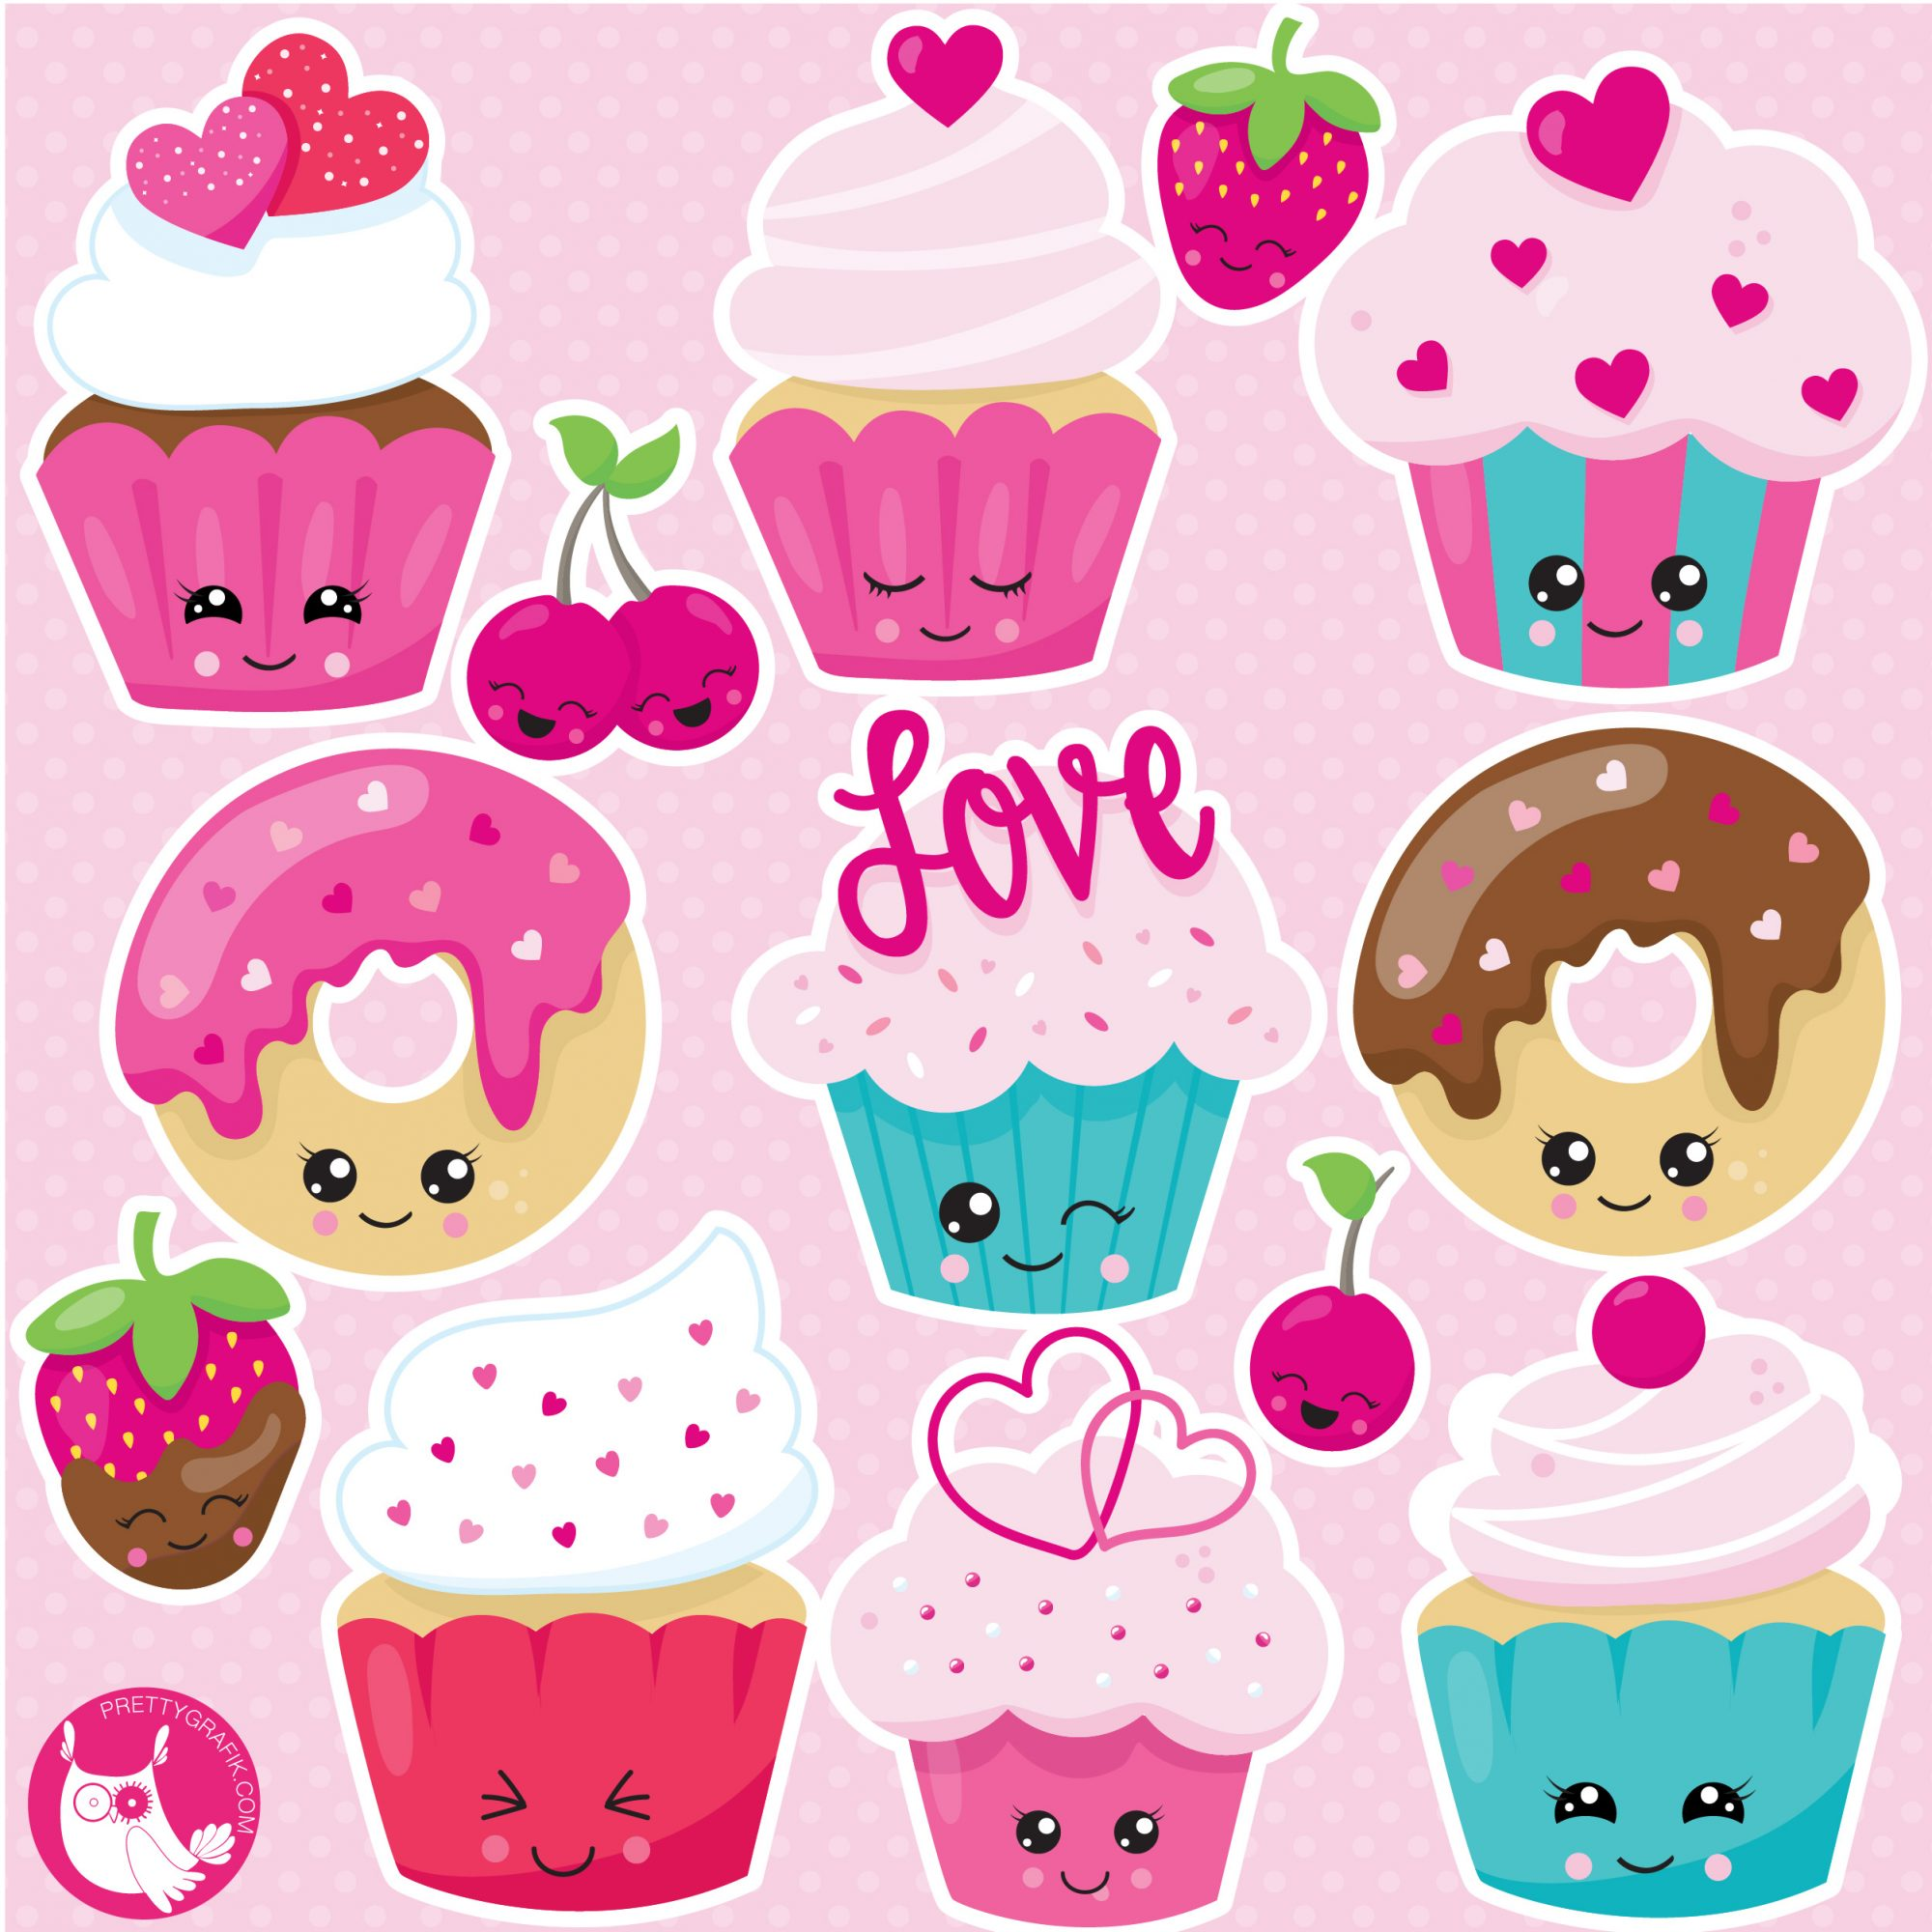 Kawaii cupcake clipart.